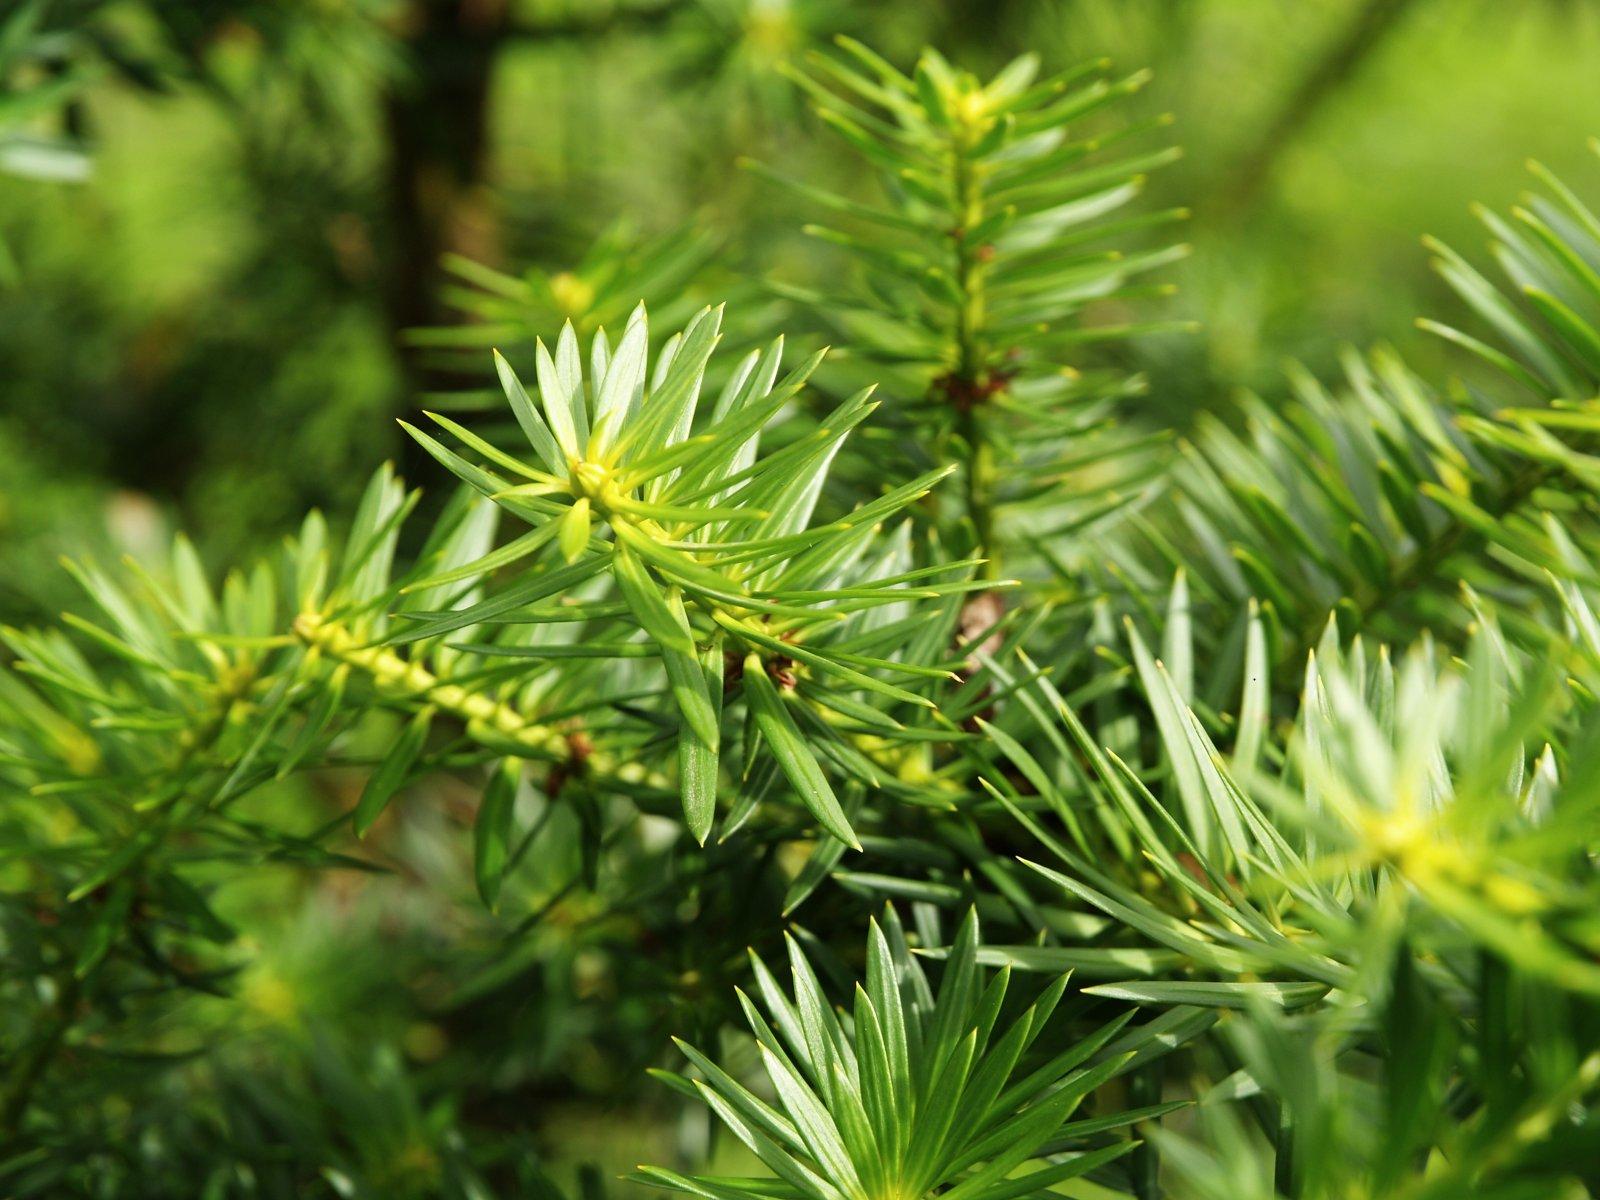 Podocarpus nubigenus